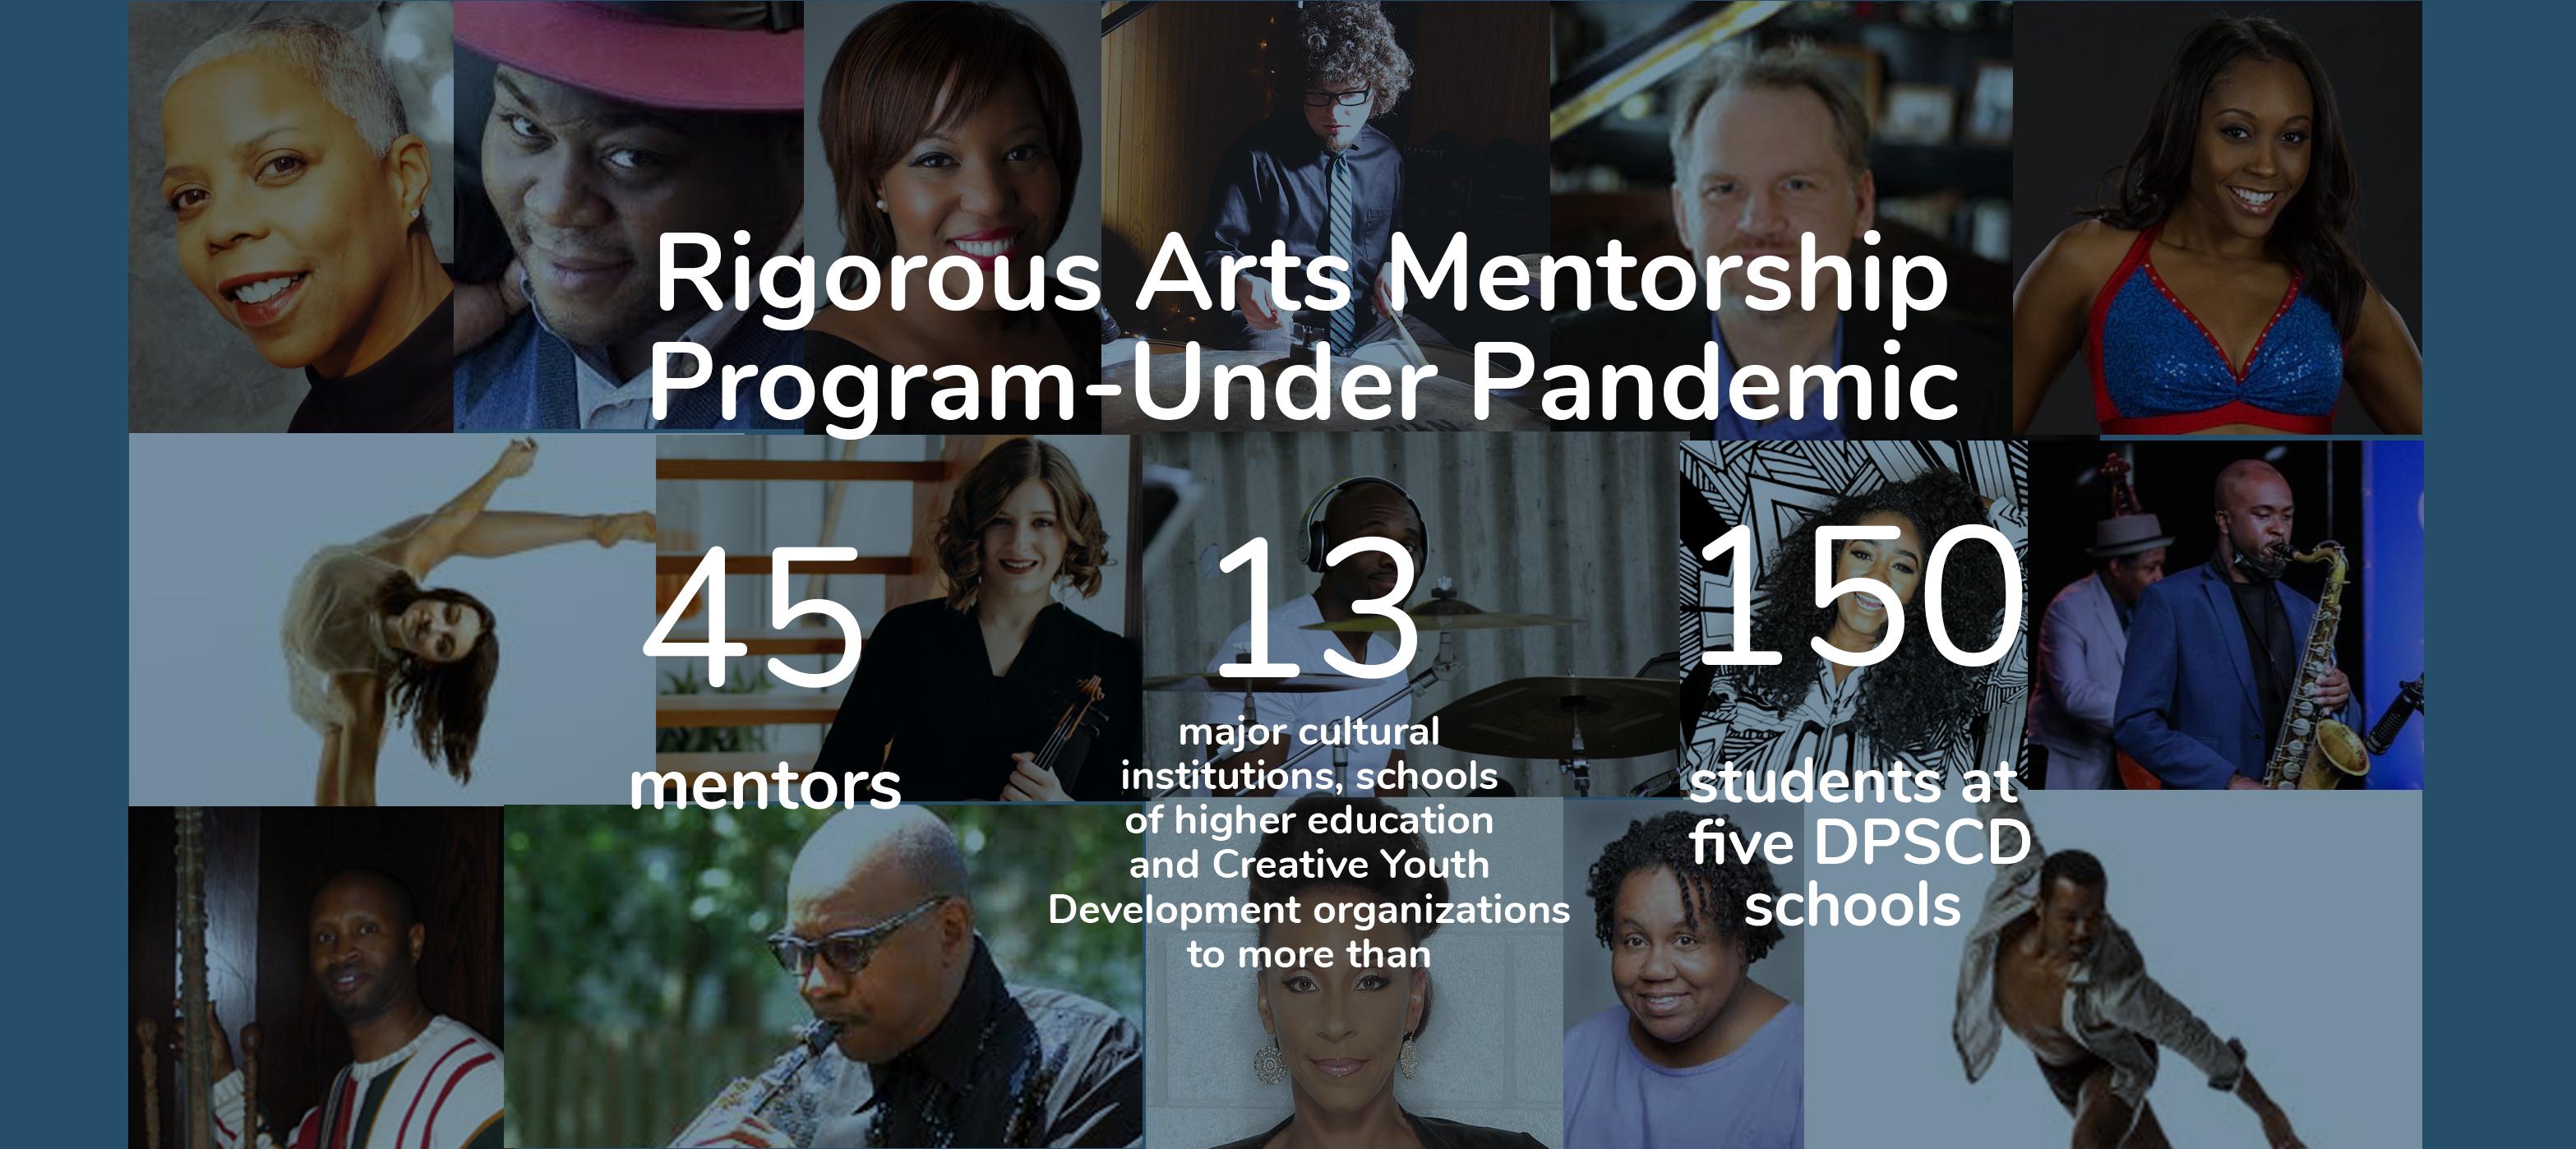 Rigorous Arts Mentorship Program-Under Pandemic